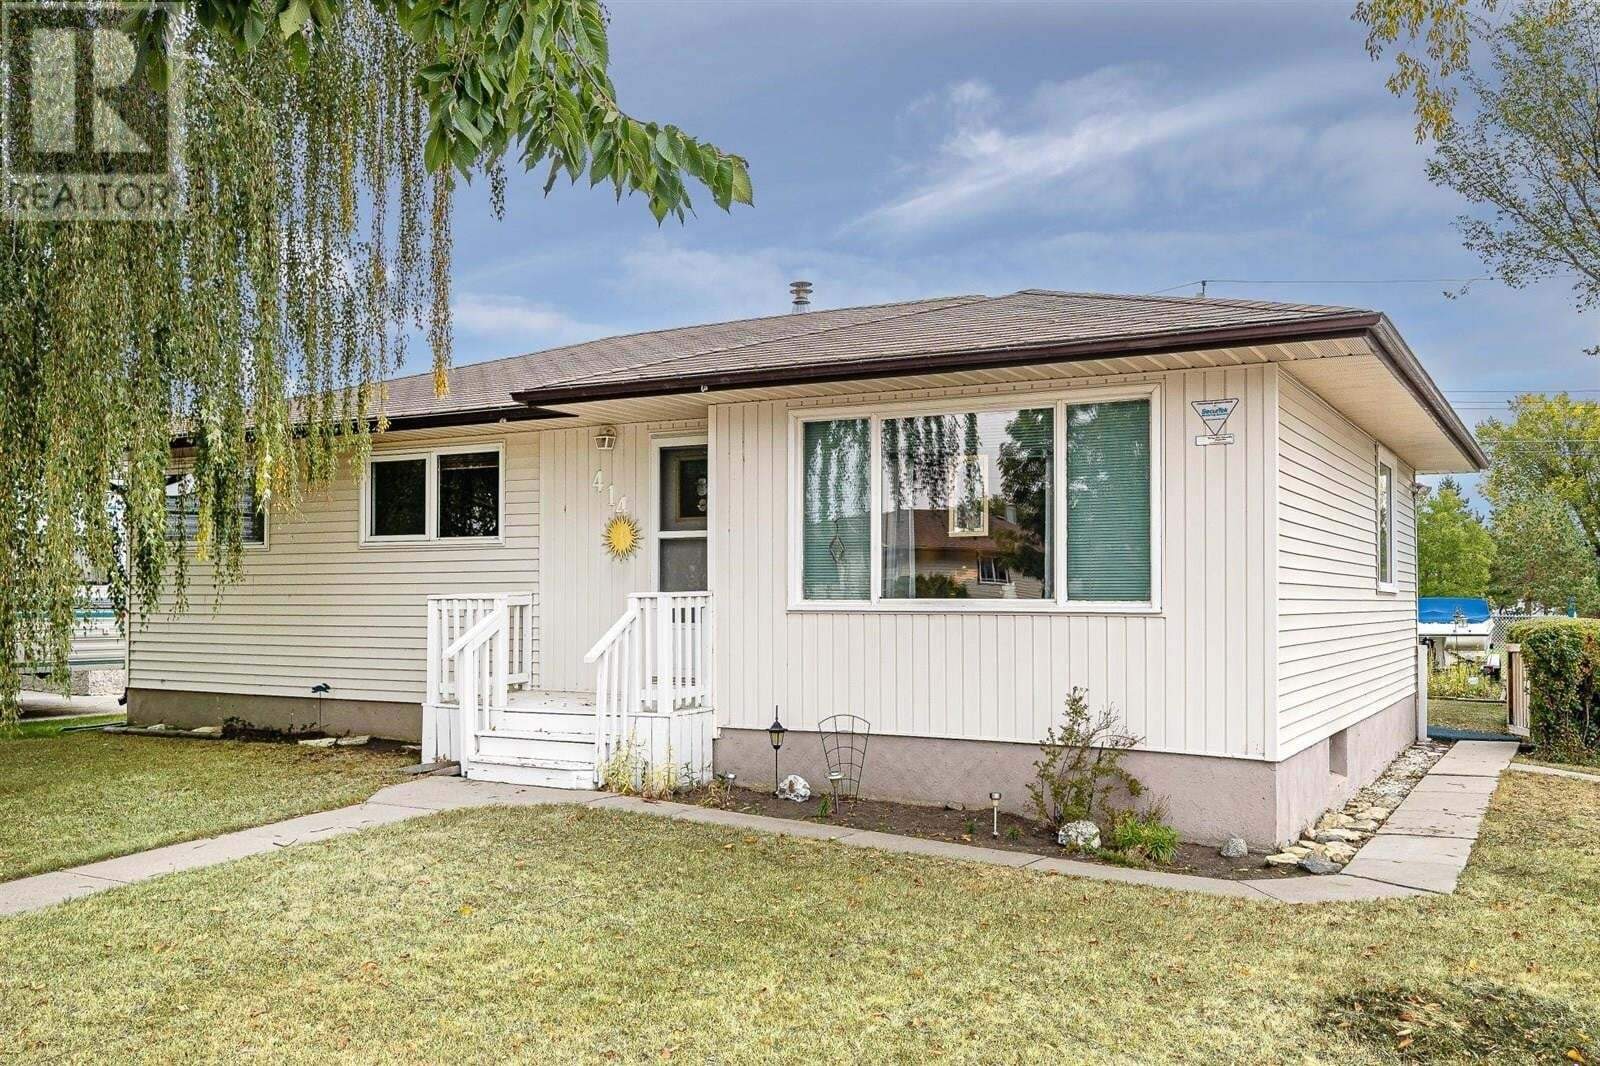 House for sale at 414 Winnipeg Ave S Saskatoon Saskatchewan - MLS: SK827007